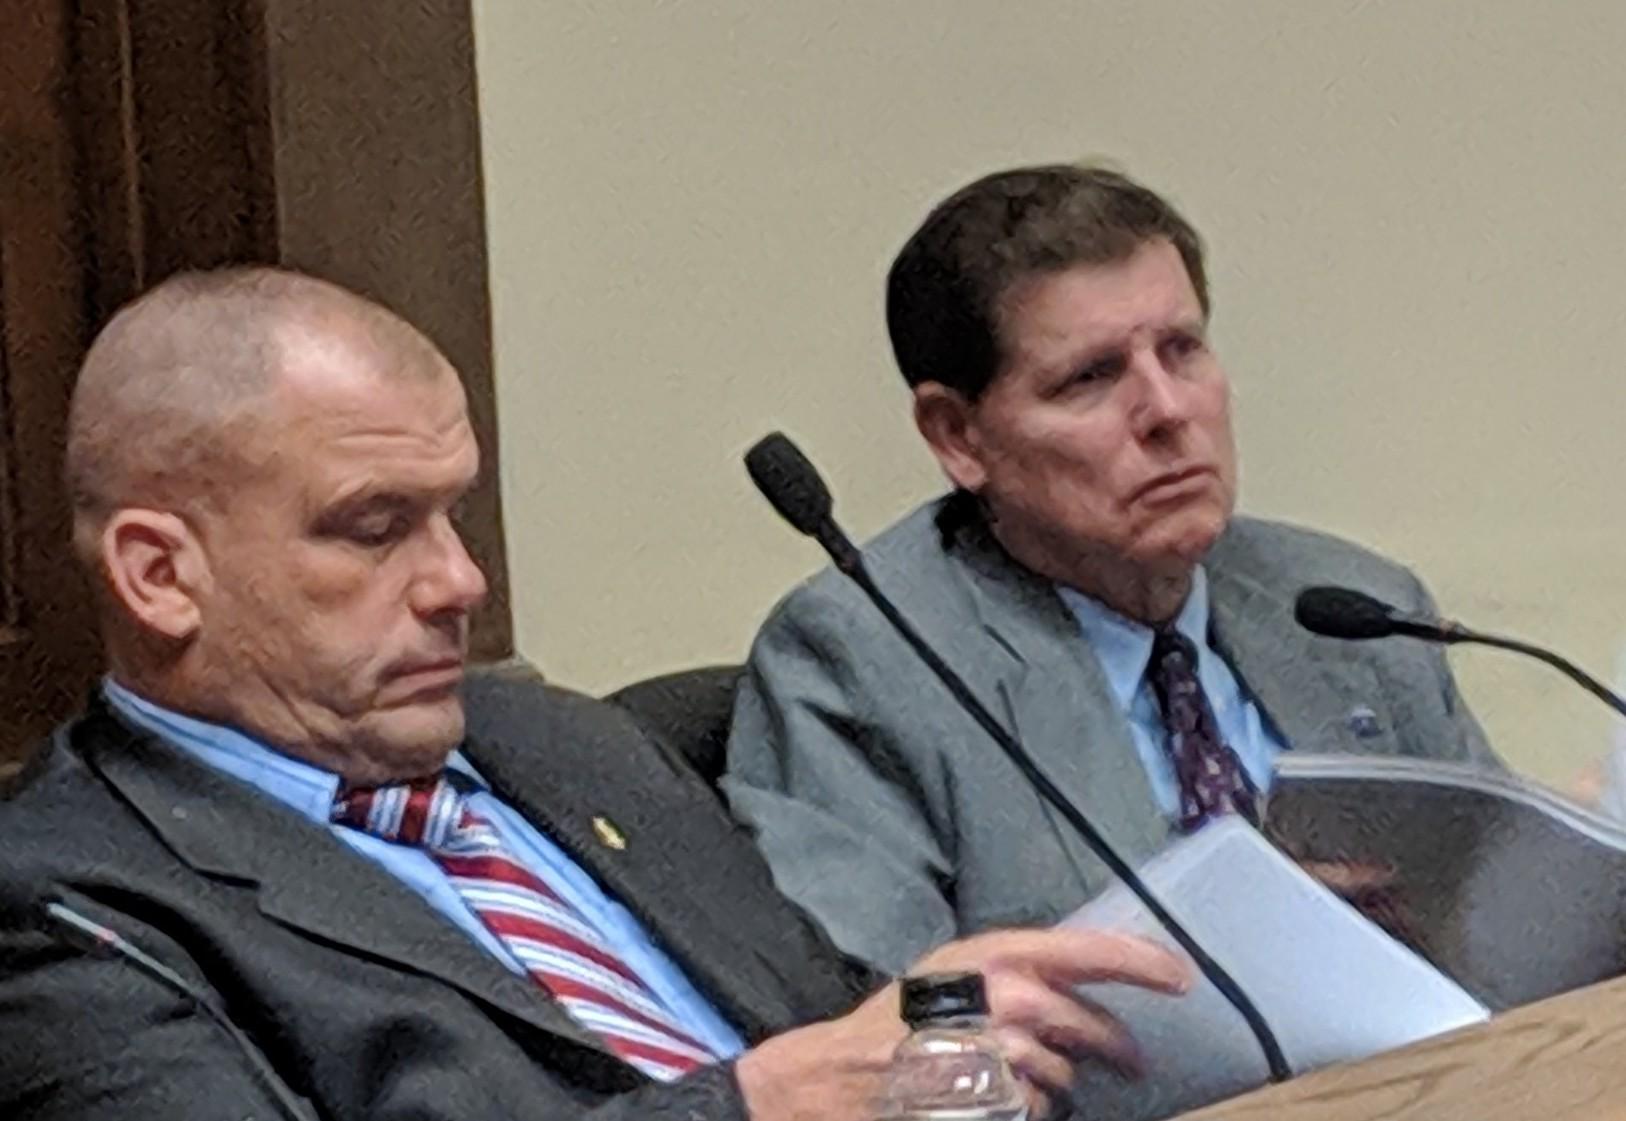 Rep. Bernard Hawkins, D-Smithfield, left, and Rep. Brian Patrick Kennedy, D-Hopkinton, claim the program would shrink the tax base.